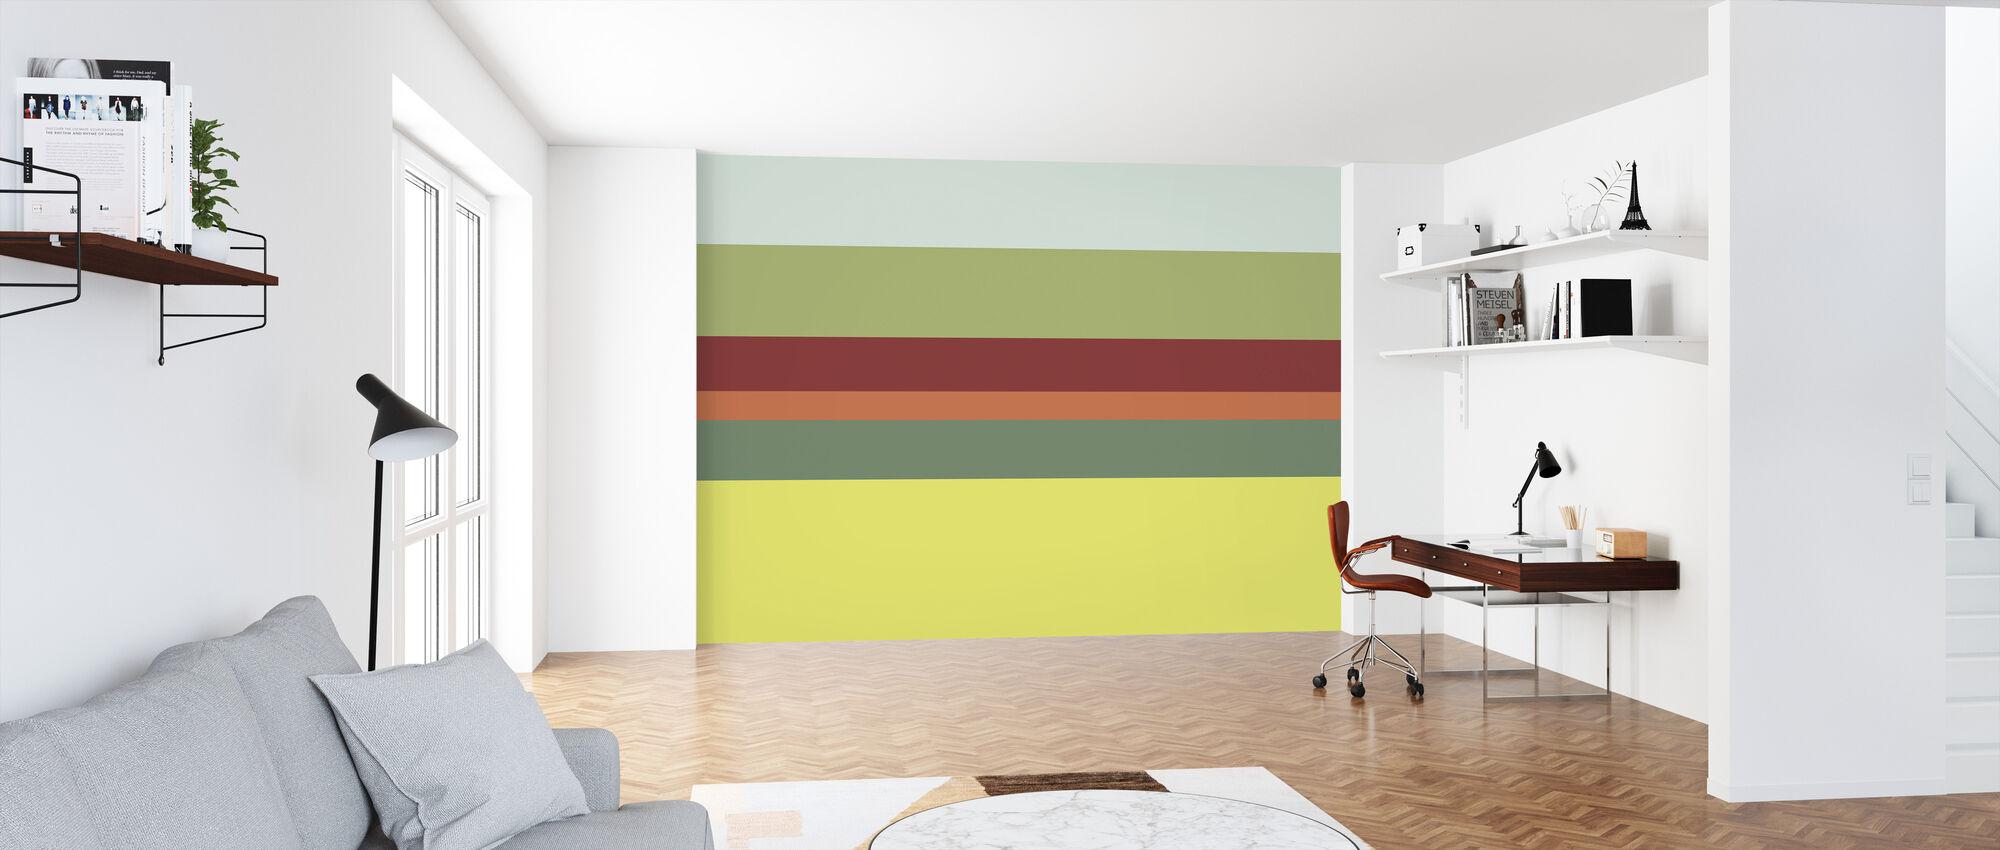 The apple crop - Wallpaper - Office